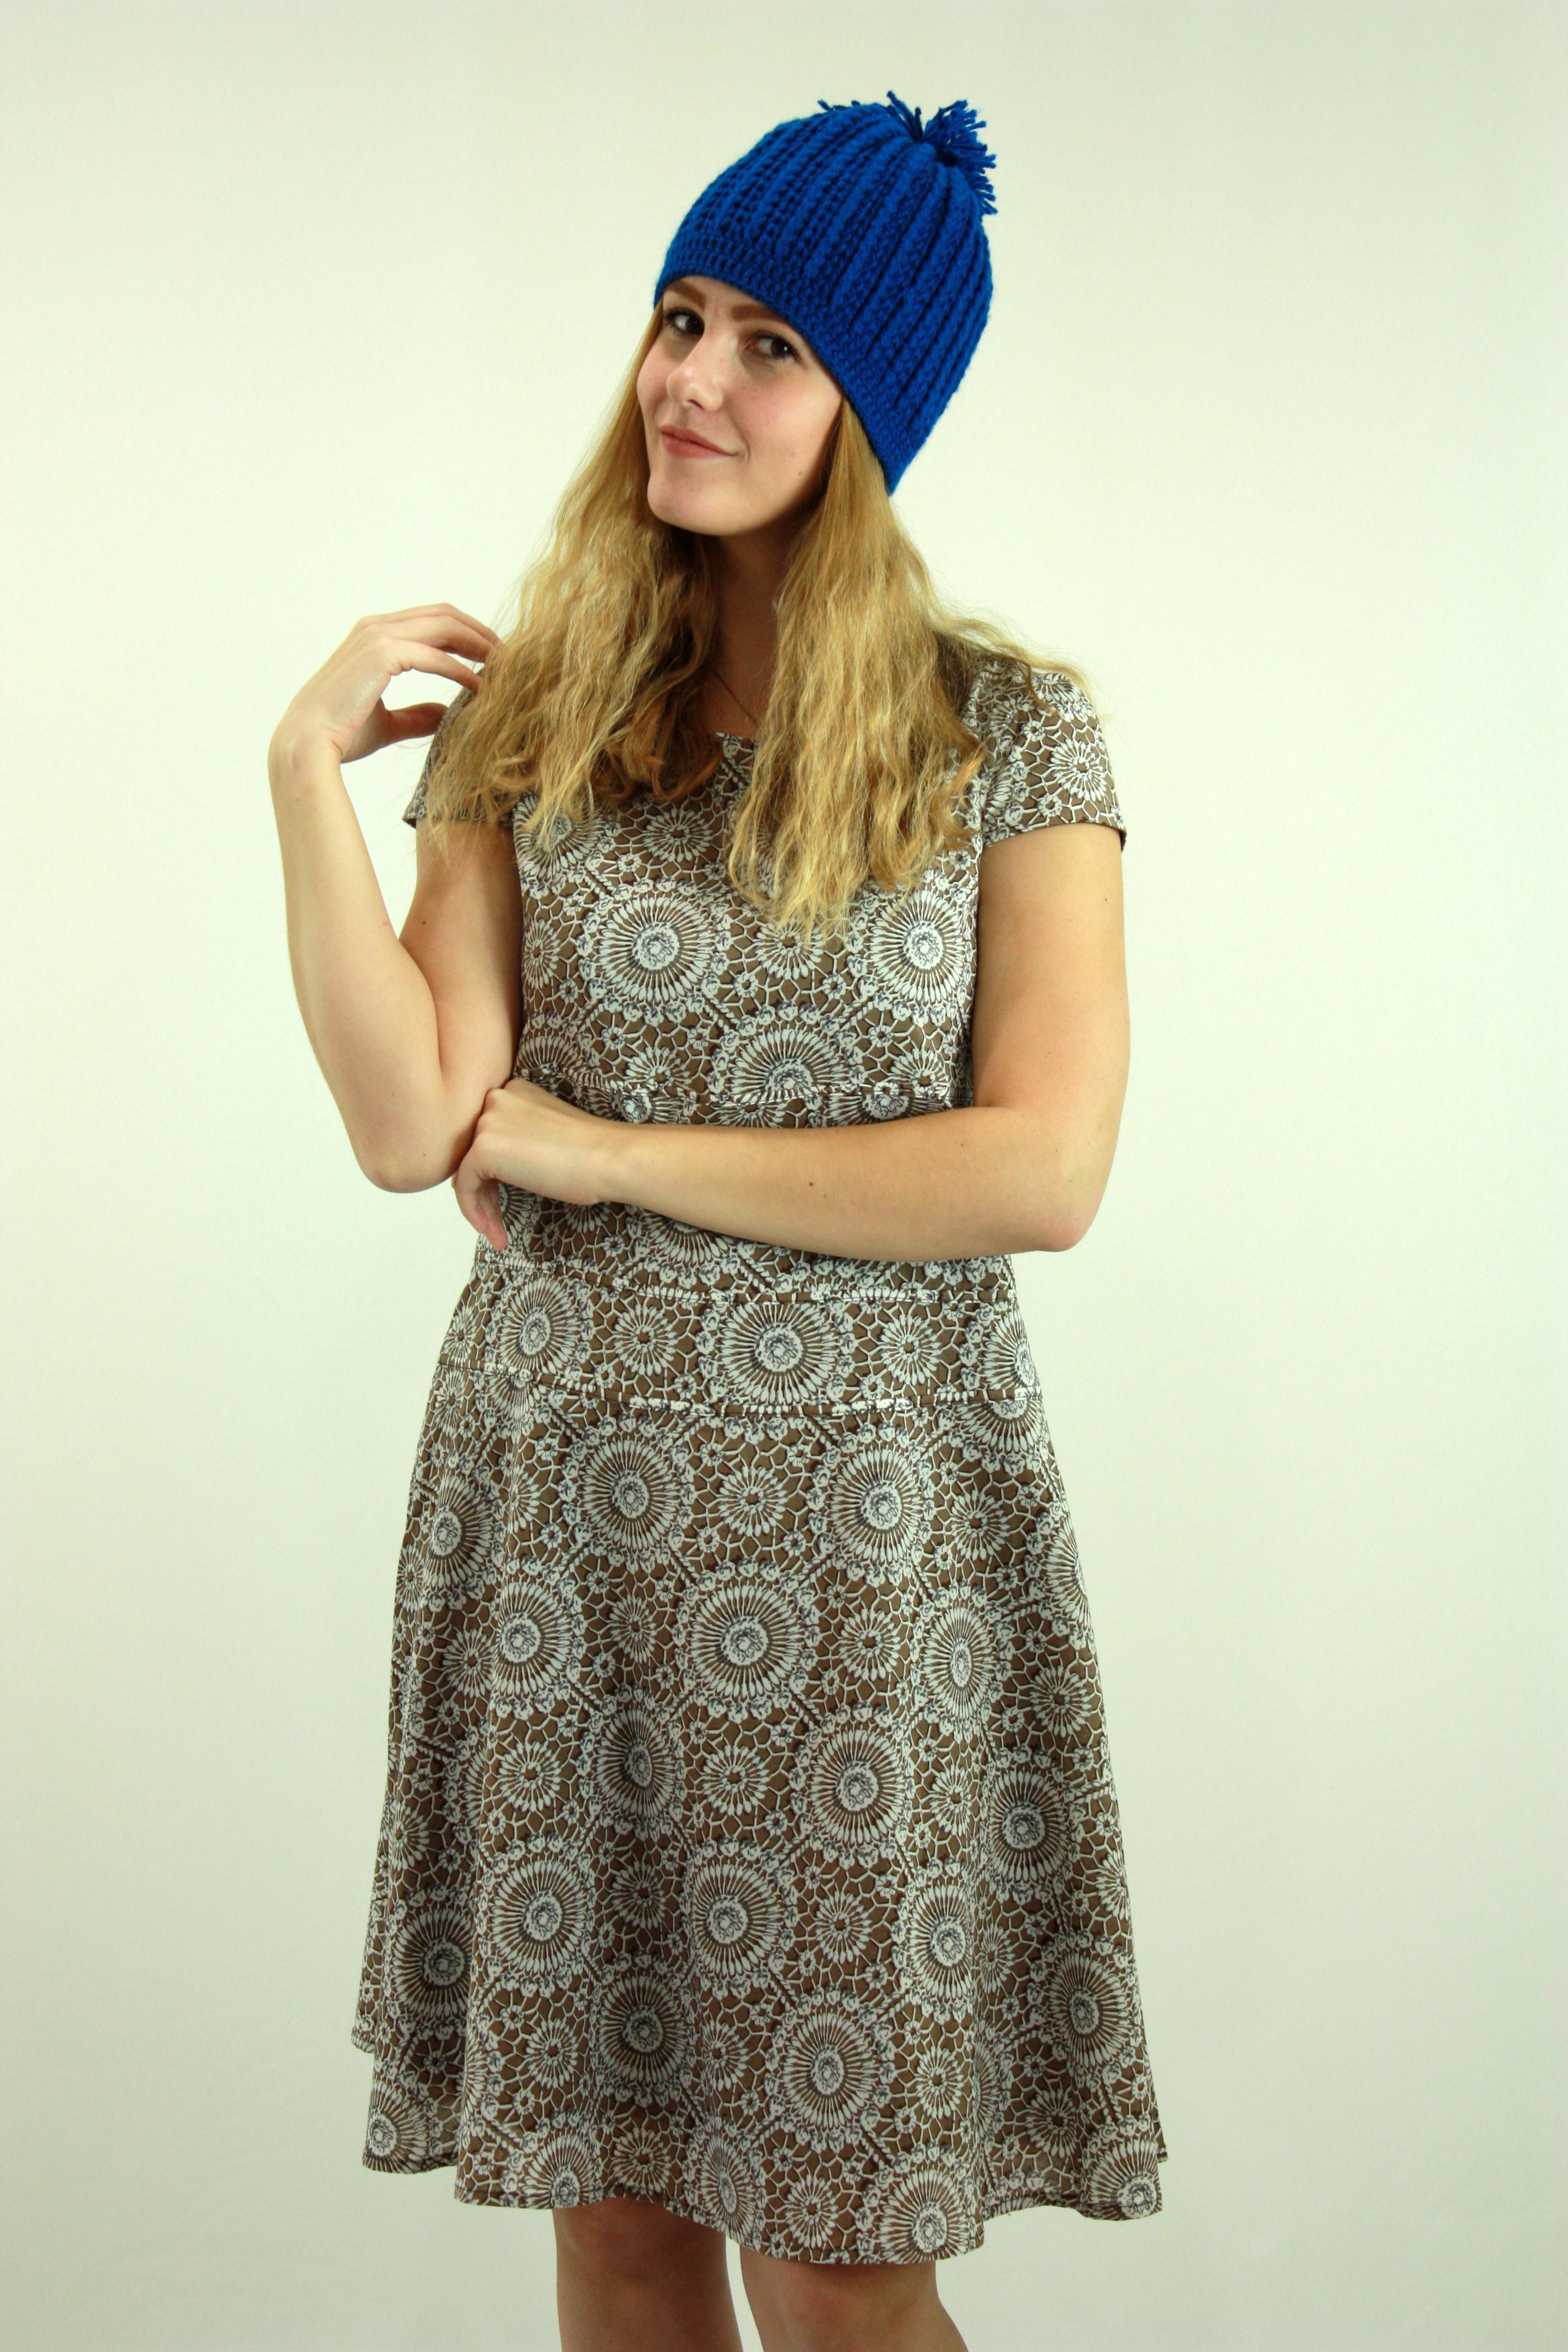 Pool camel sleeved dresses